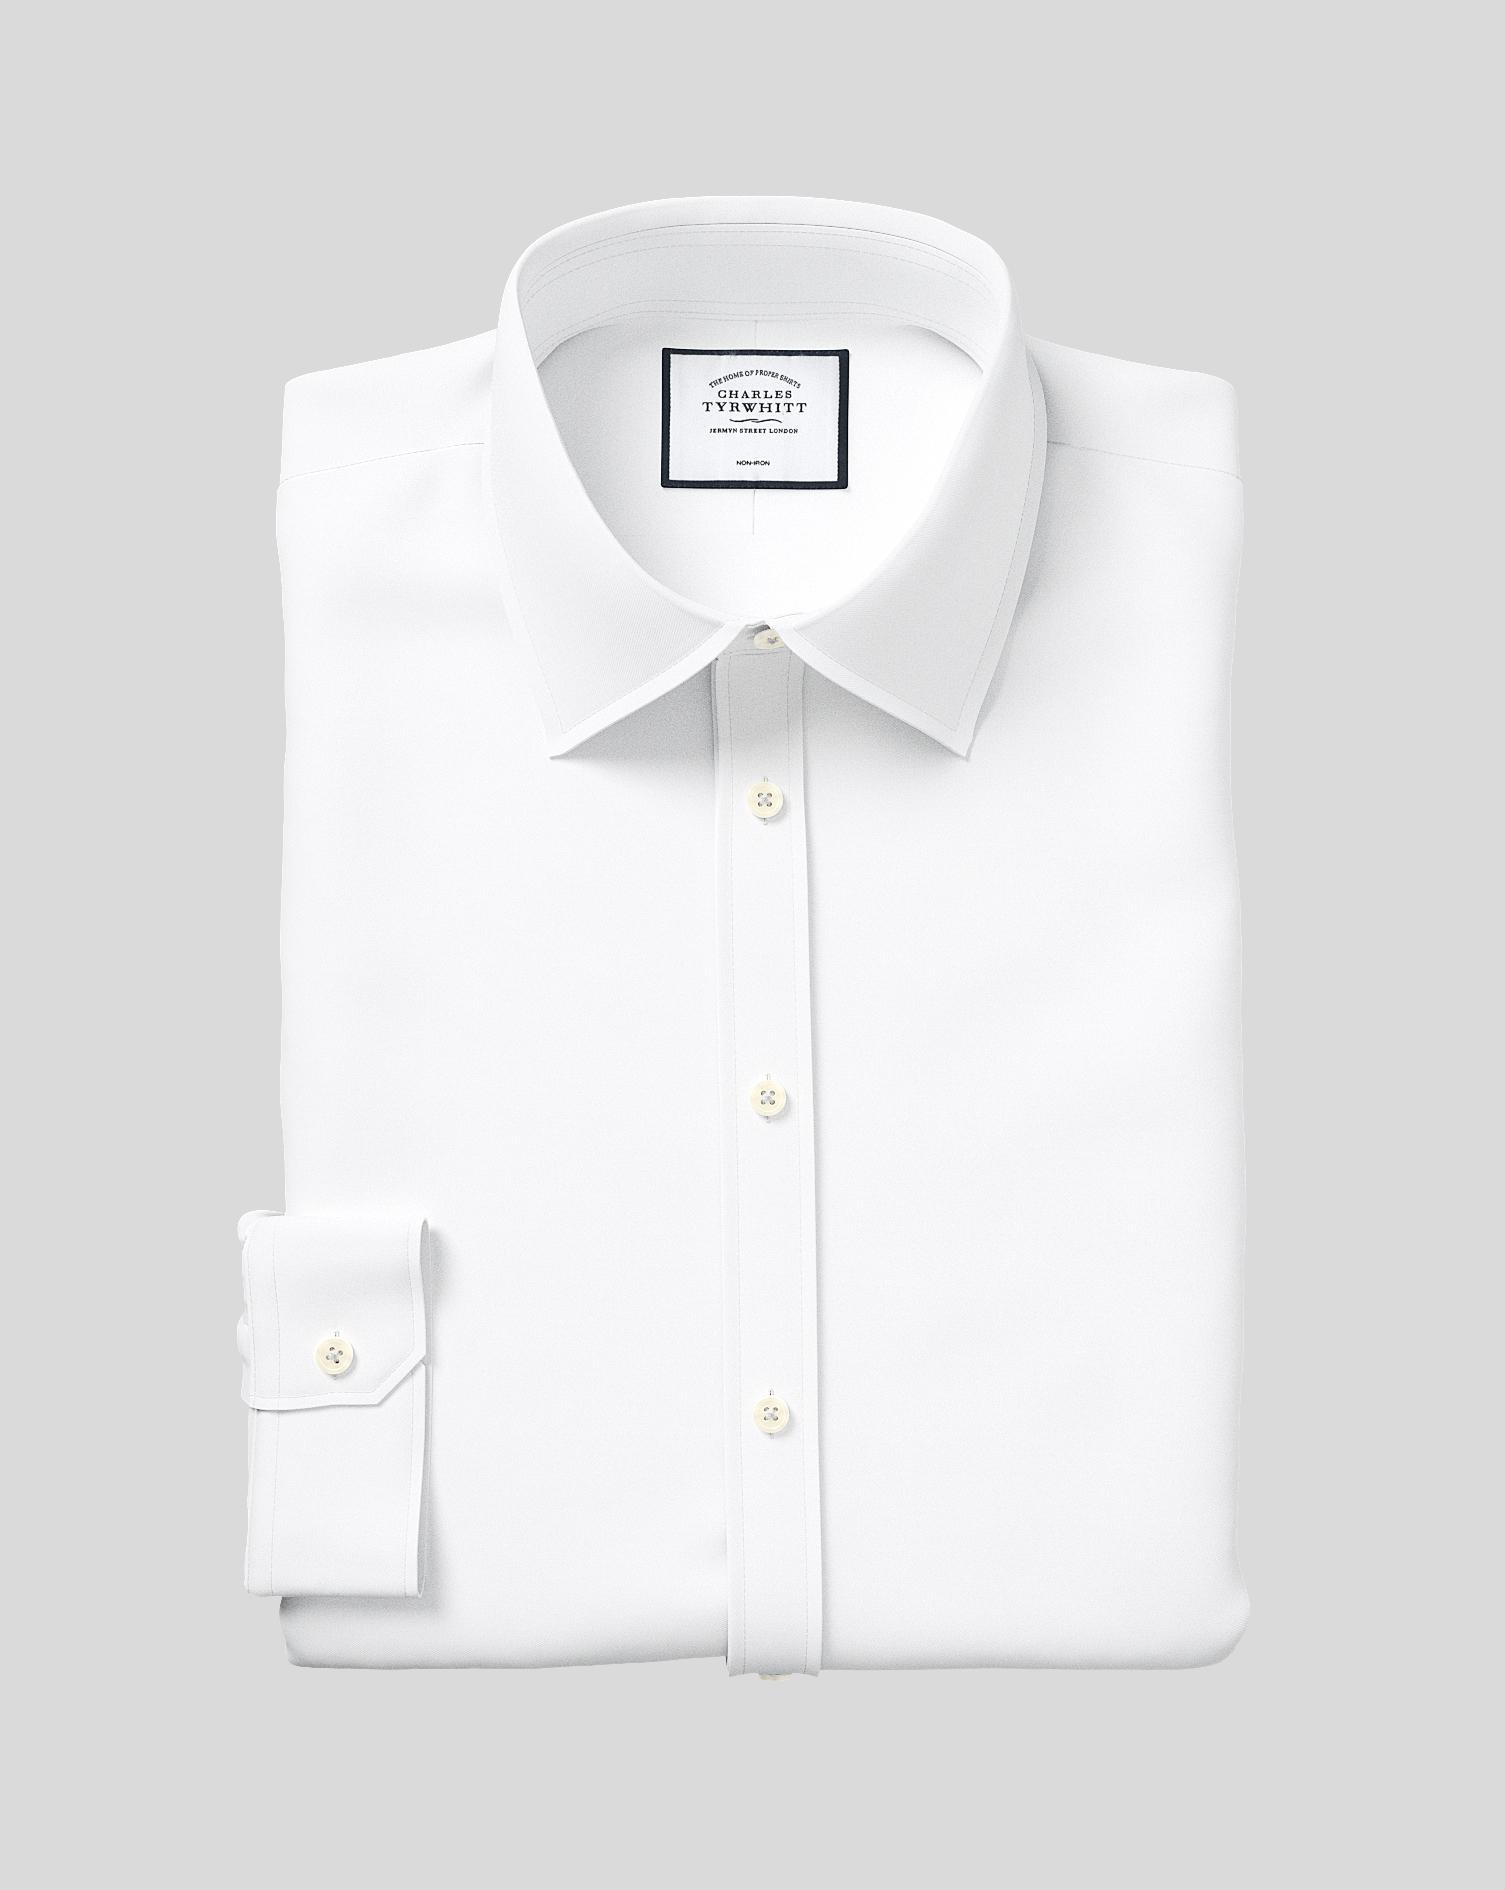 Cotton Super Slim Fit Non-Iron Twill White Shirt